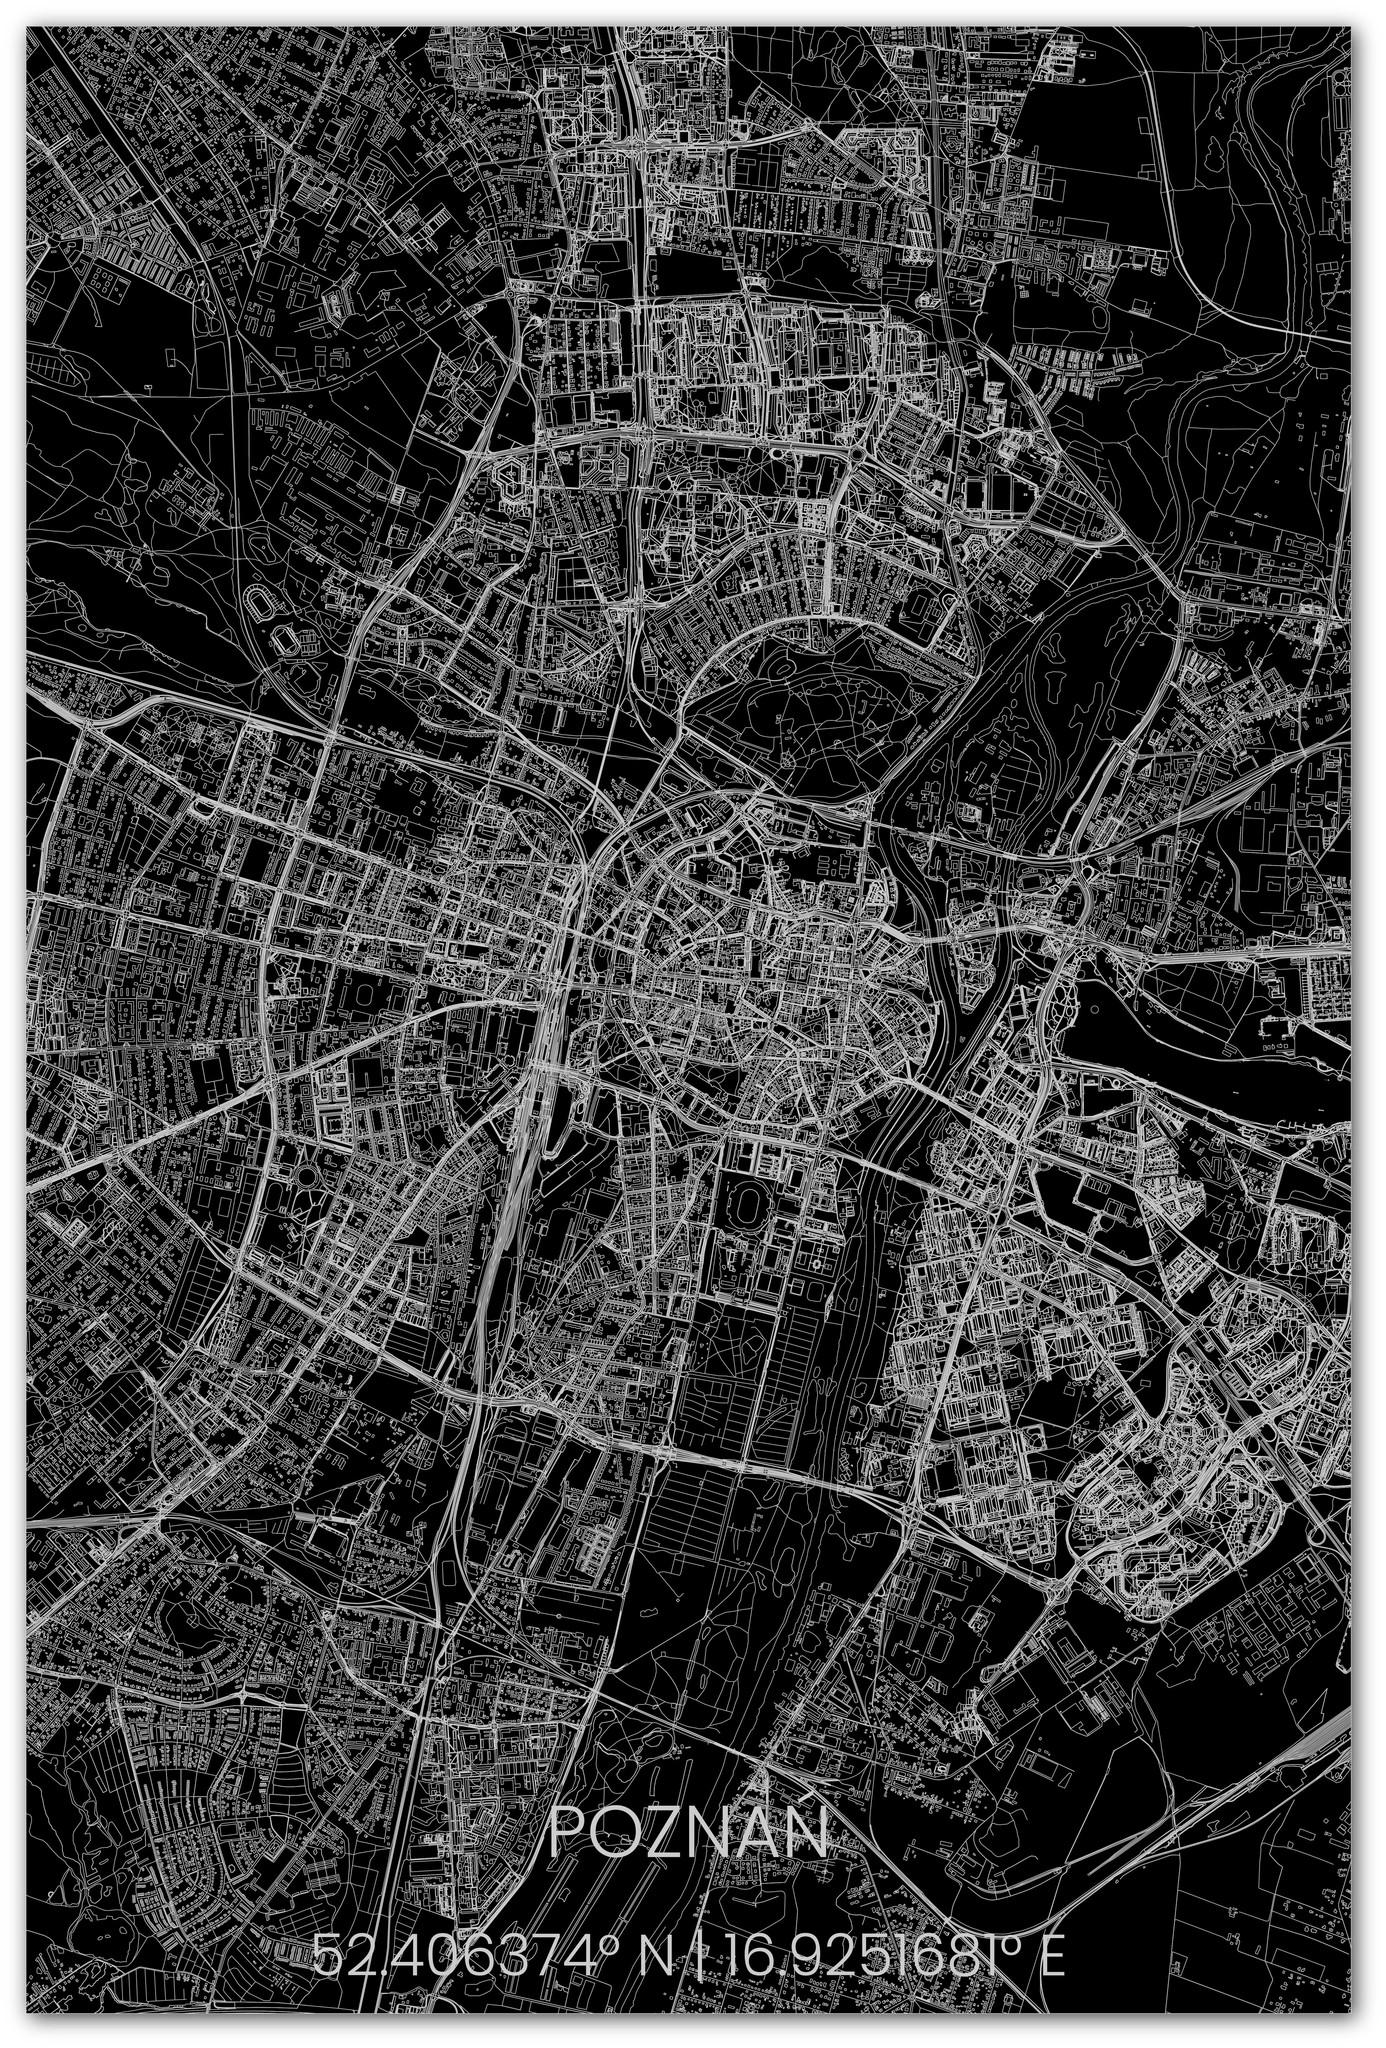 Stadsplattegrond Poznań XL-2